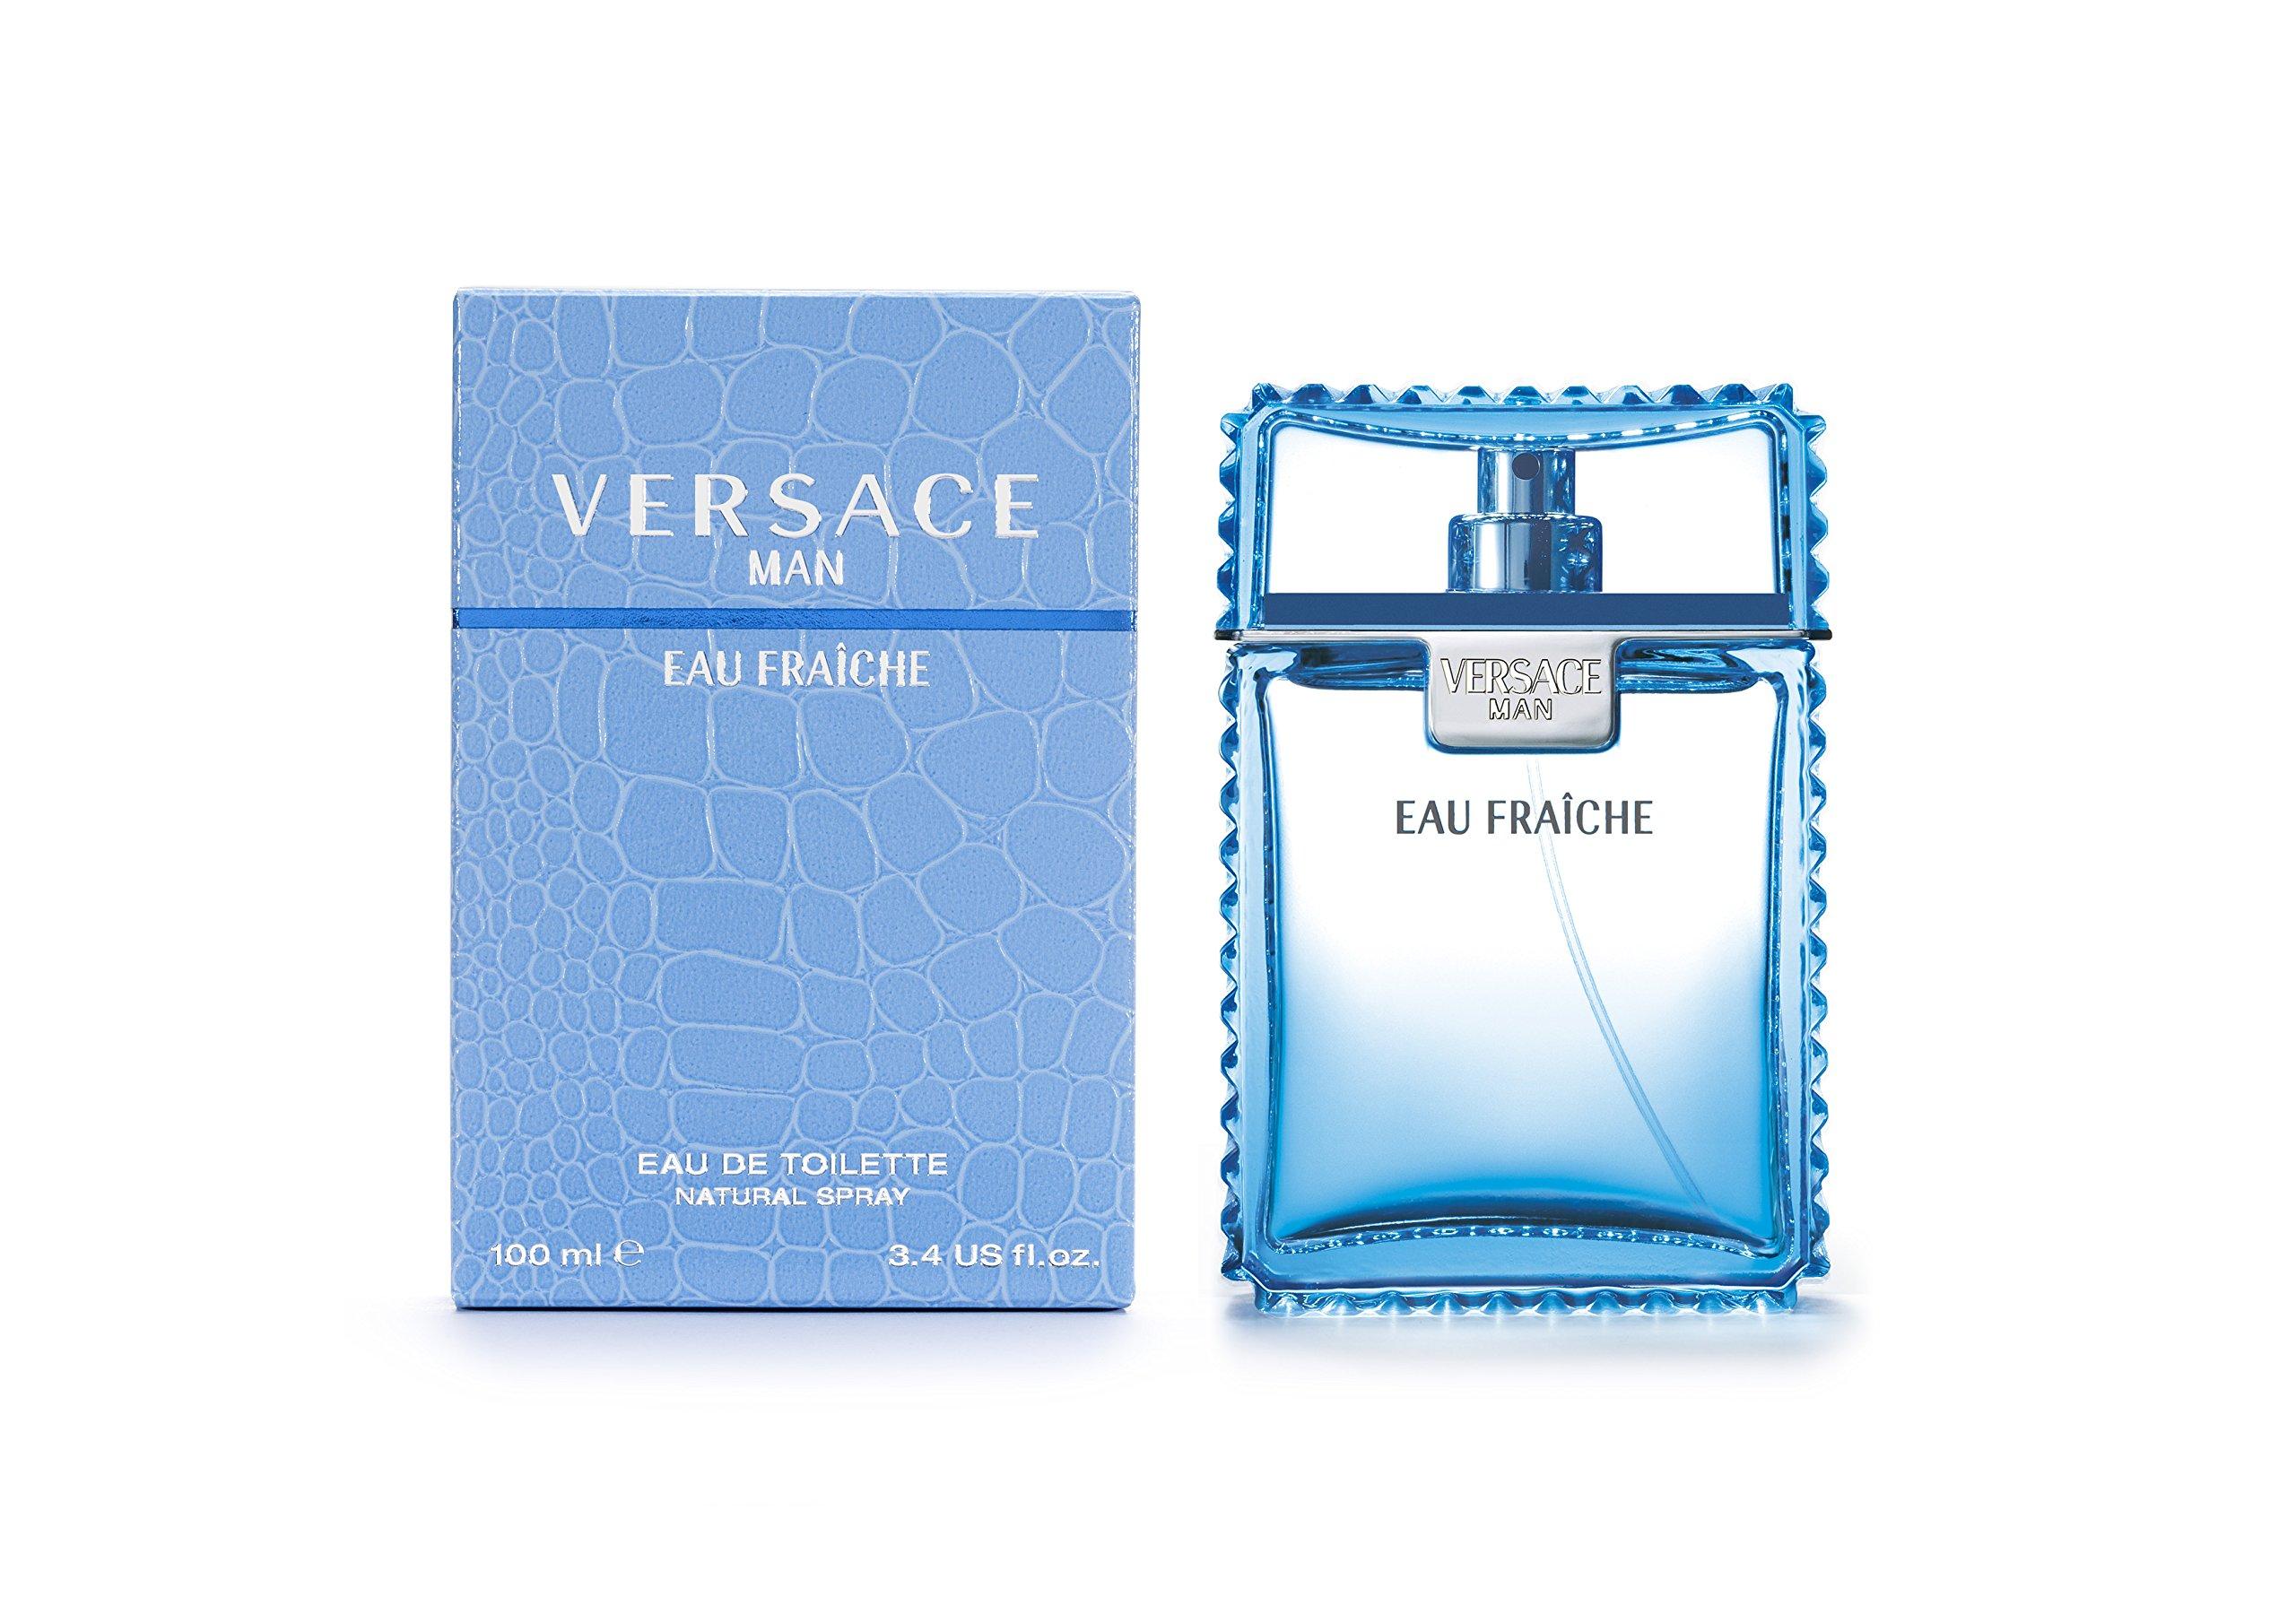 Versace Man Eau Fraiche By Gianni Versace For Men Edt Spray 3.4 Fl Oz by Versace